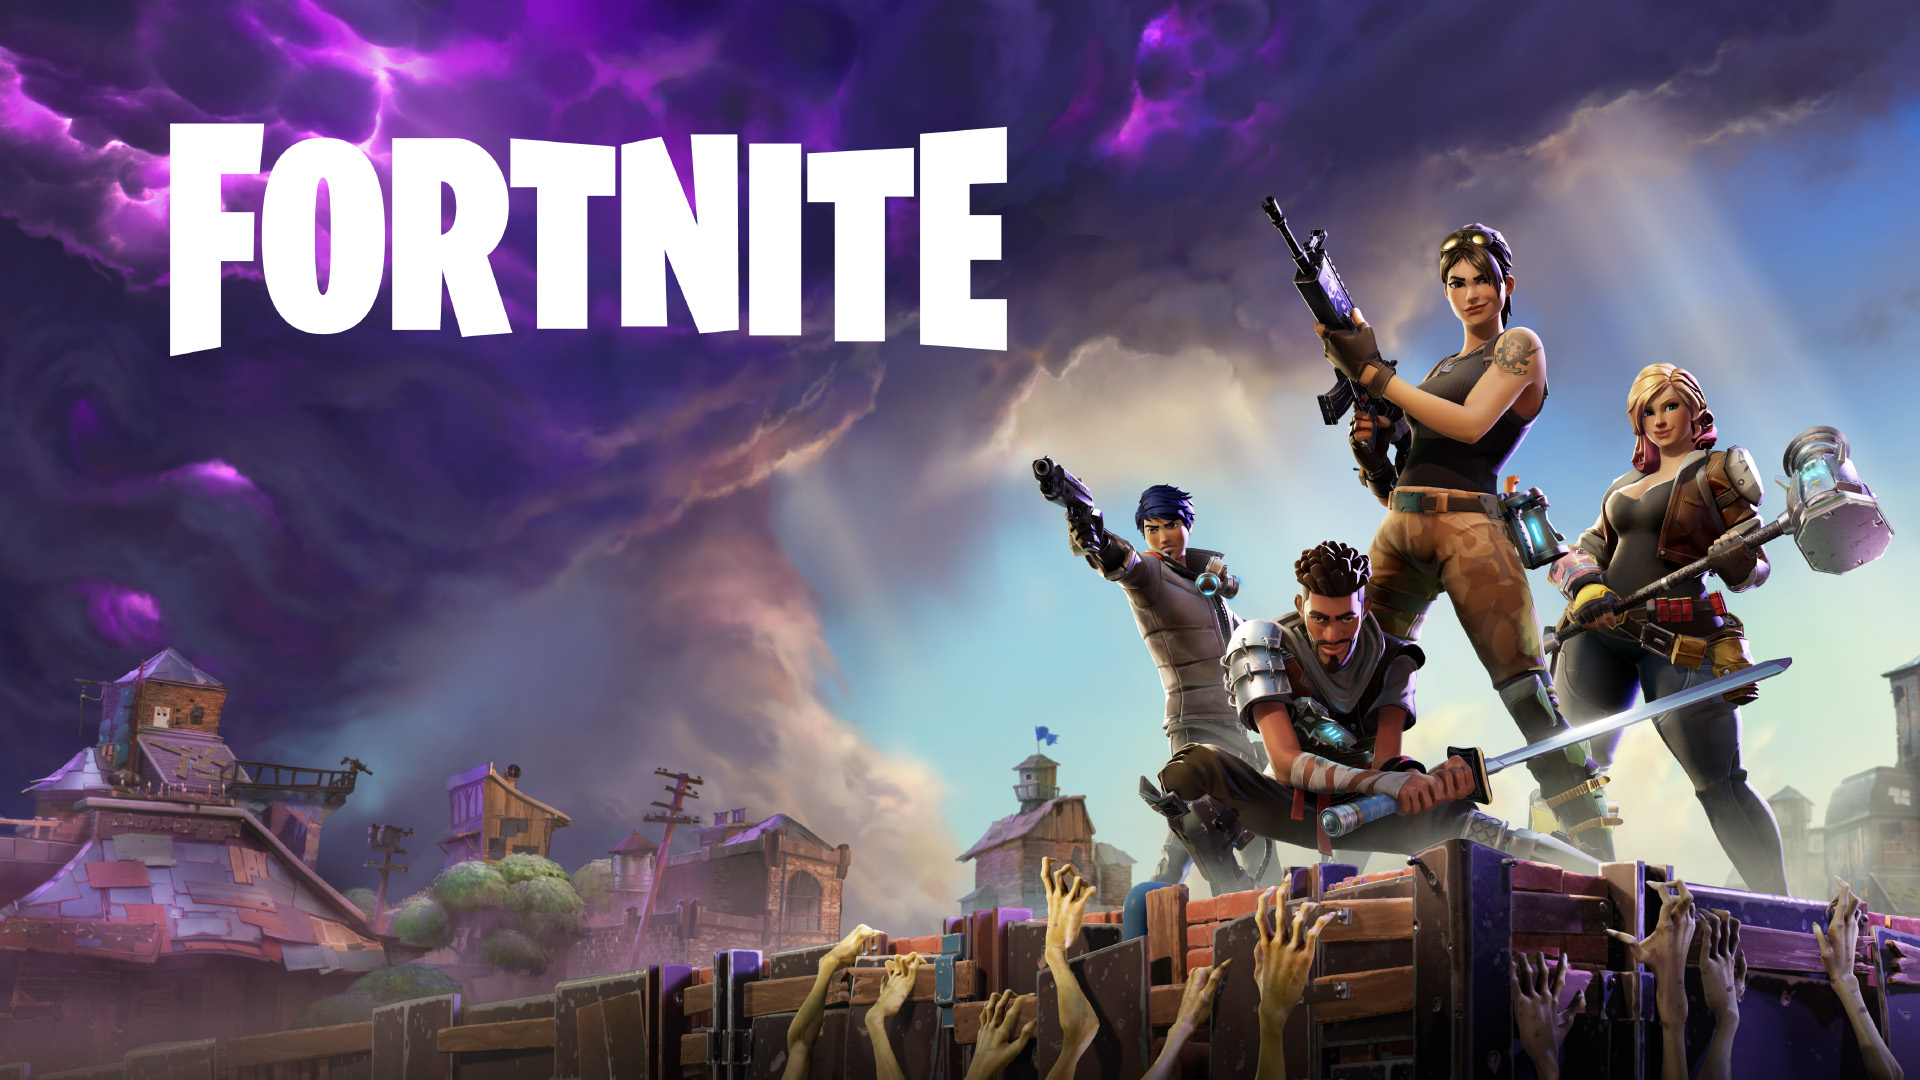 Fortnite [Video Game] Wallpaper HD 1920x1080